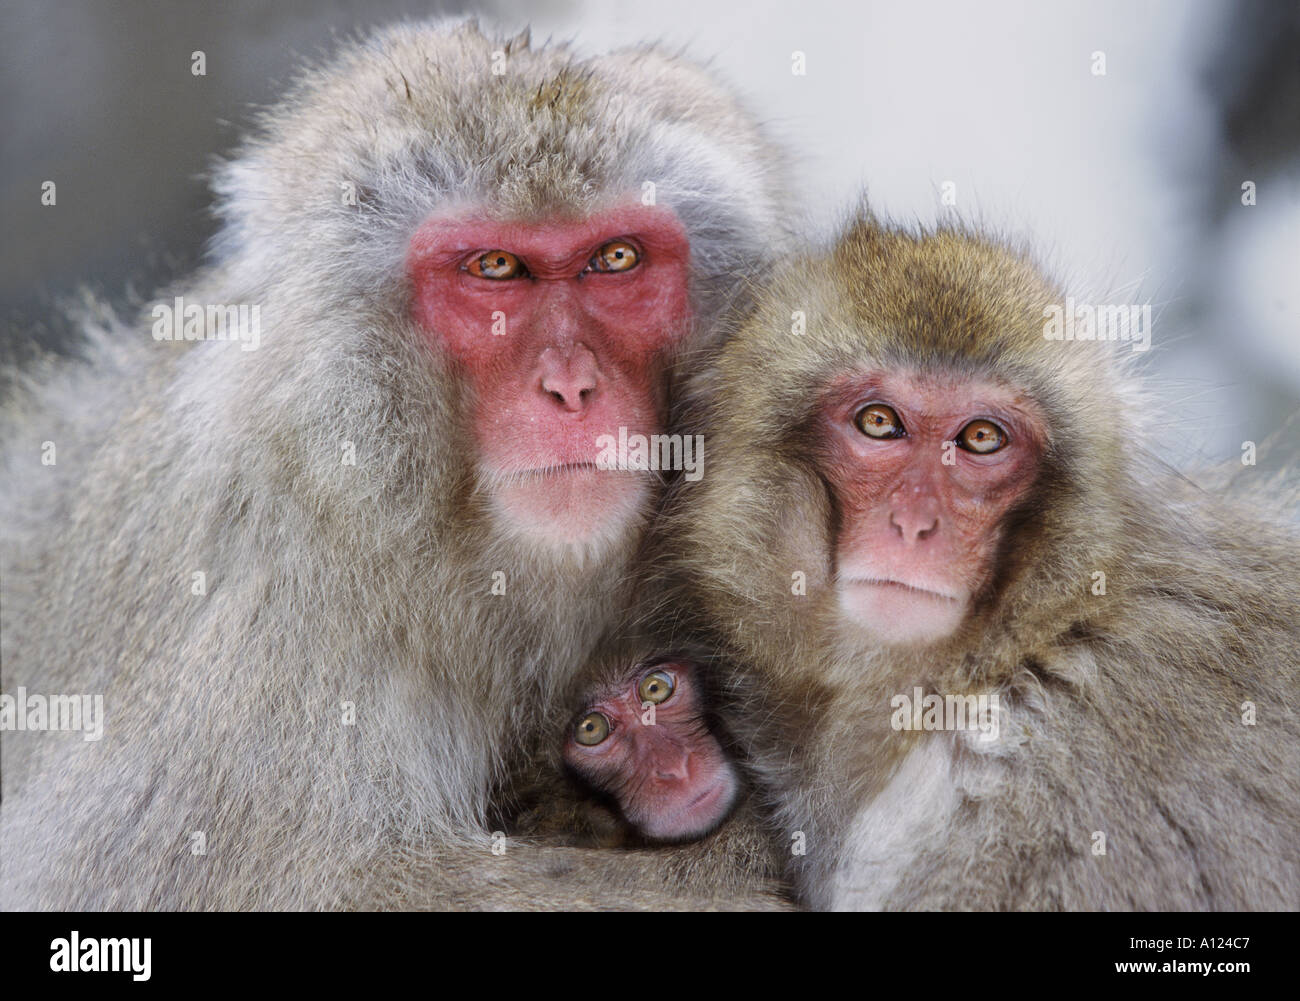 Familia de monos de nieve Parque Nacional Jigokudani Japón Imagen De Stock